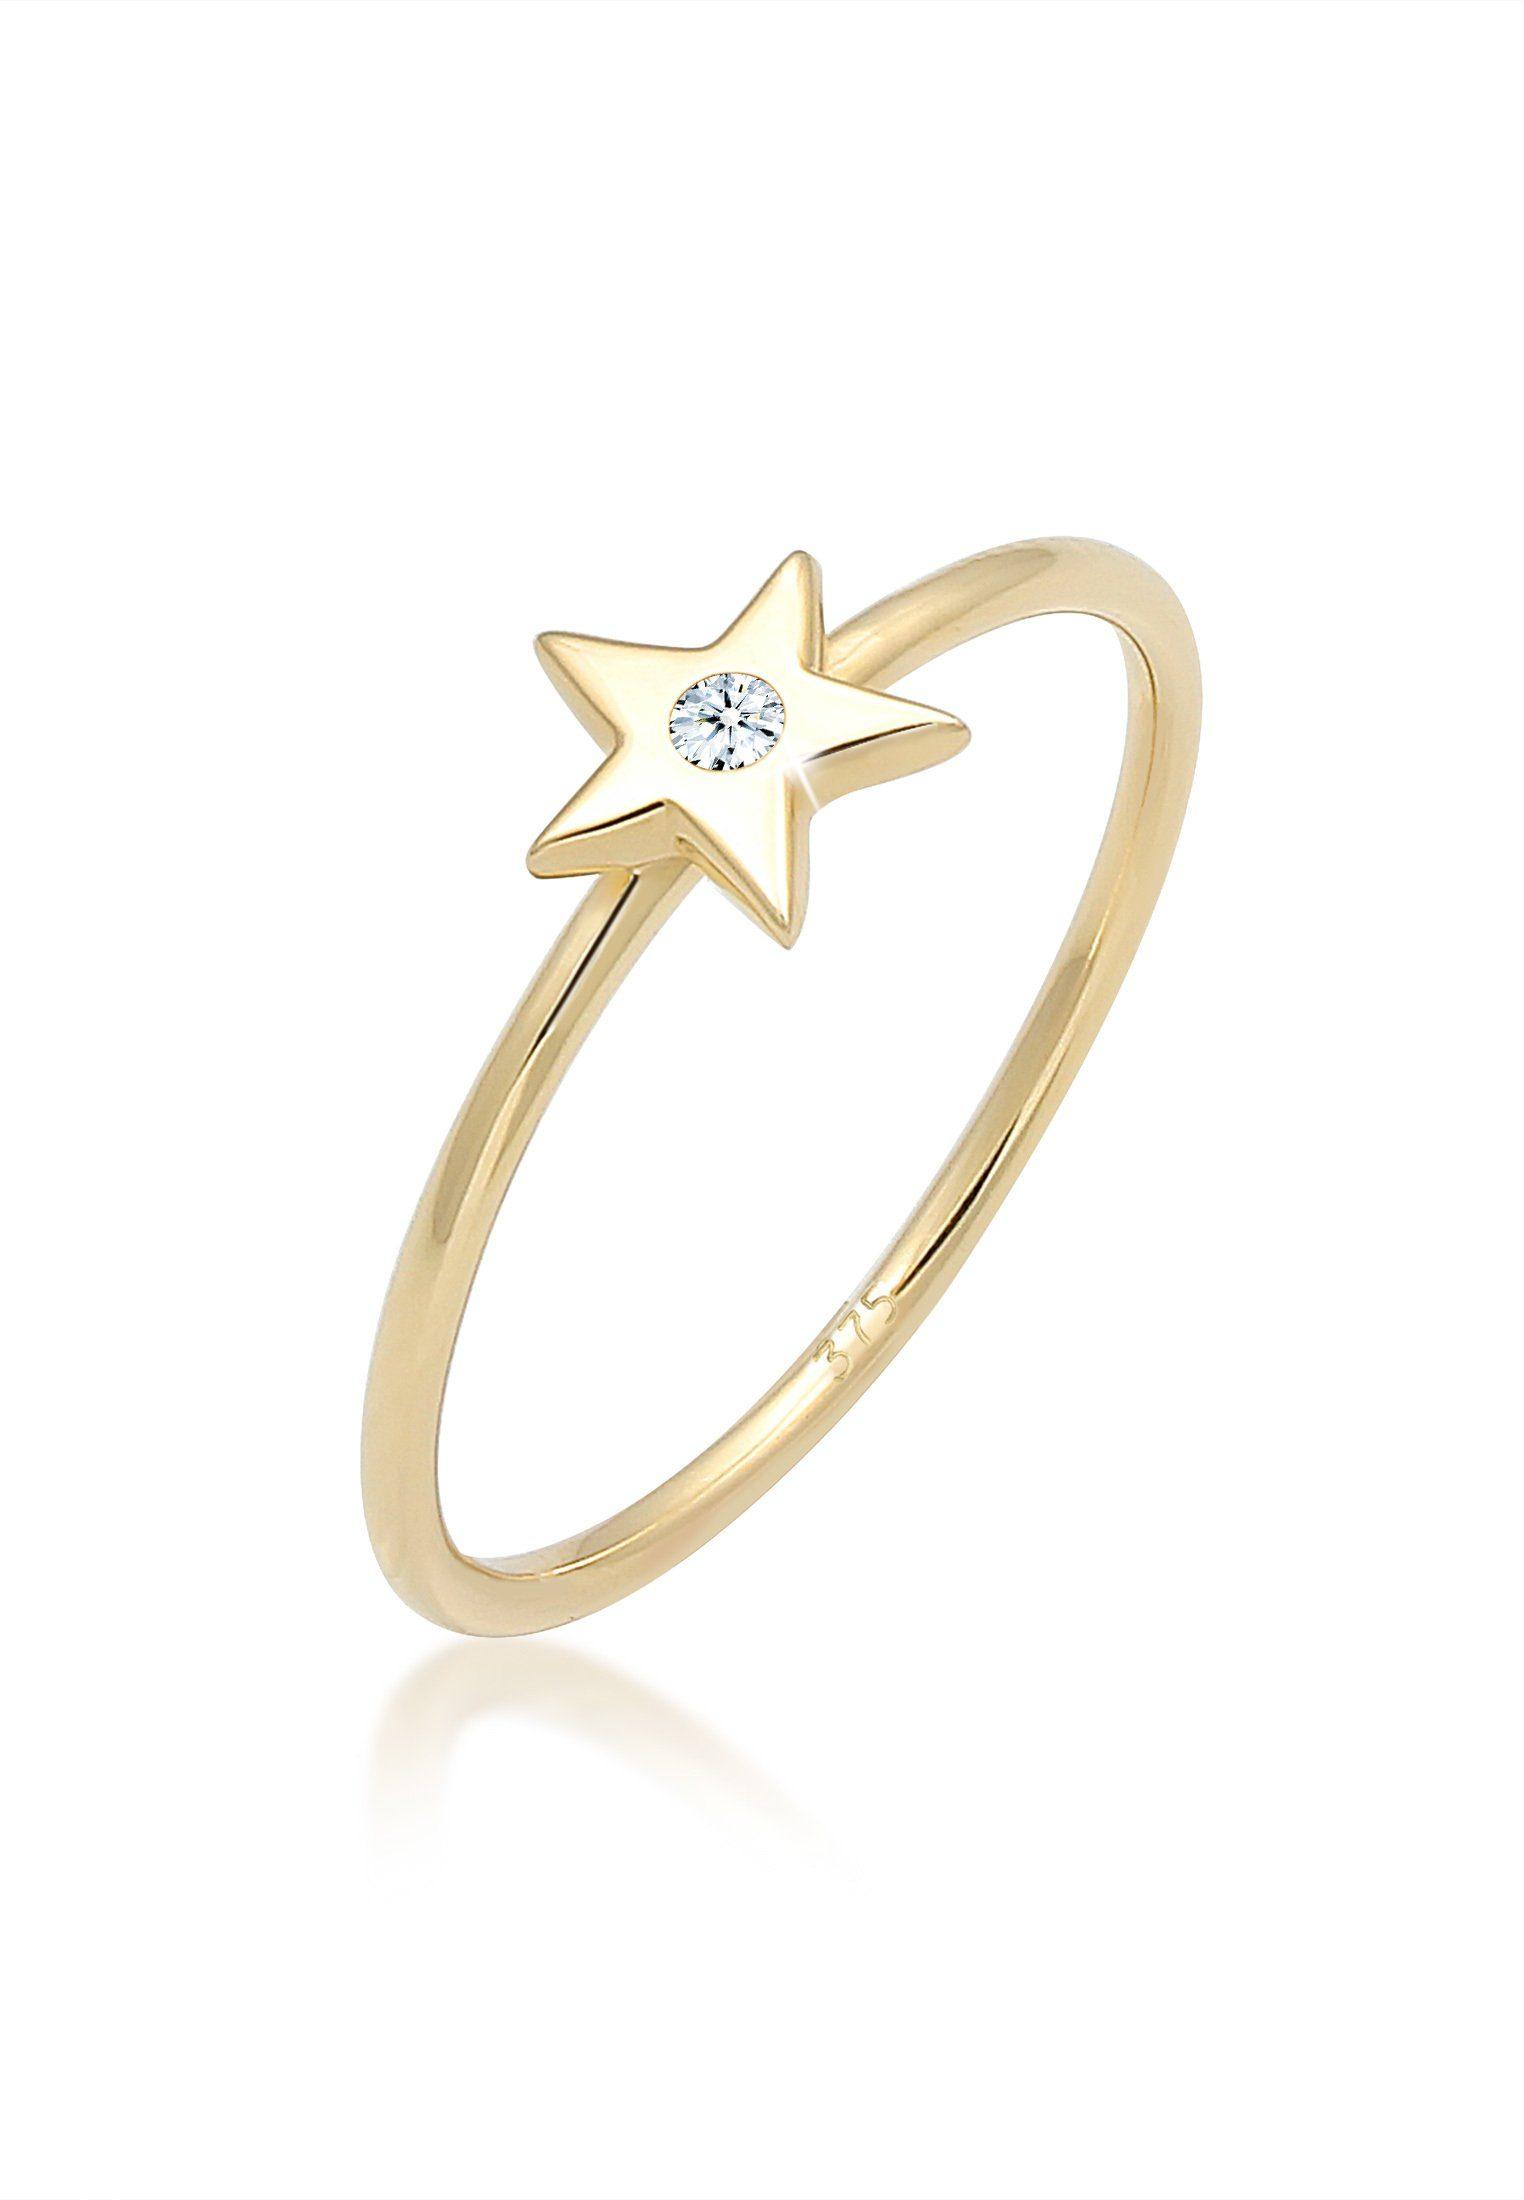 Elli Diamantring Bandring Stern Astro Diamant (002ct) 375 Gelbgold   Schmuck > Ringe > Diamantringe   Goldfarben   Elli